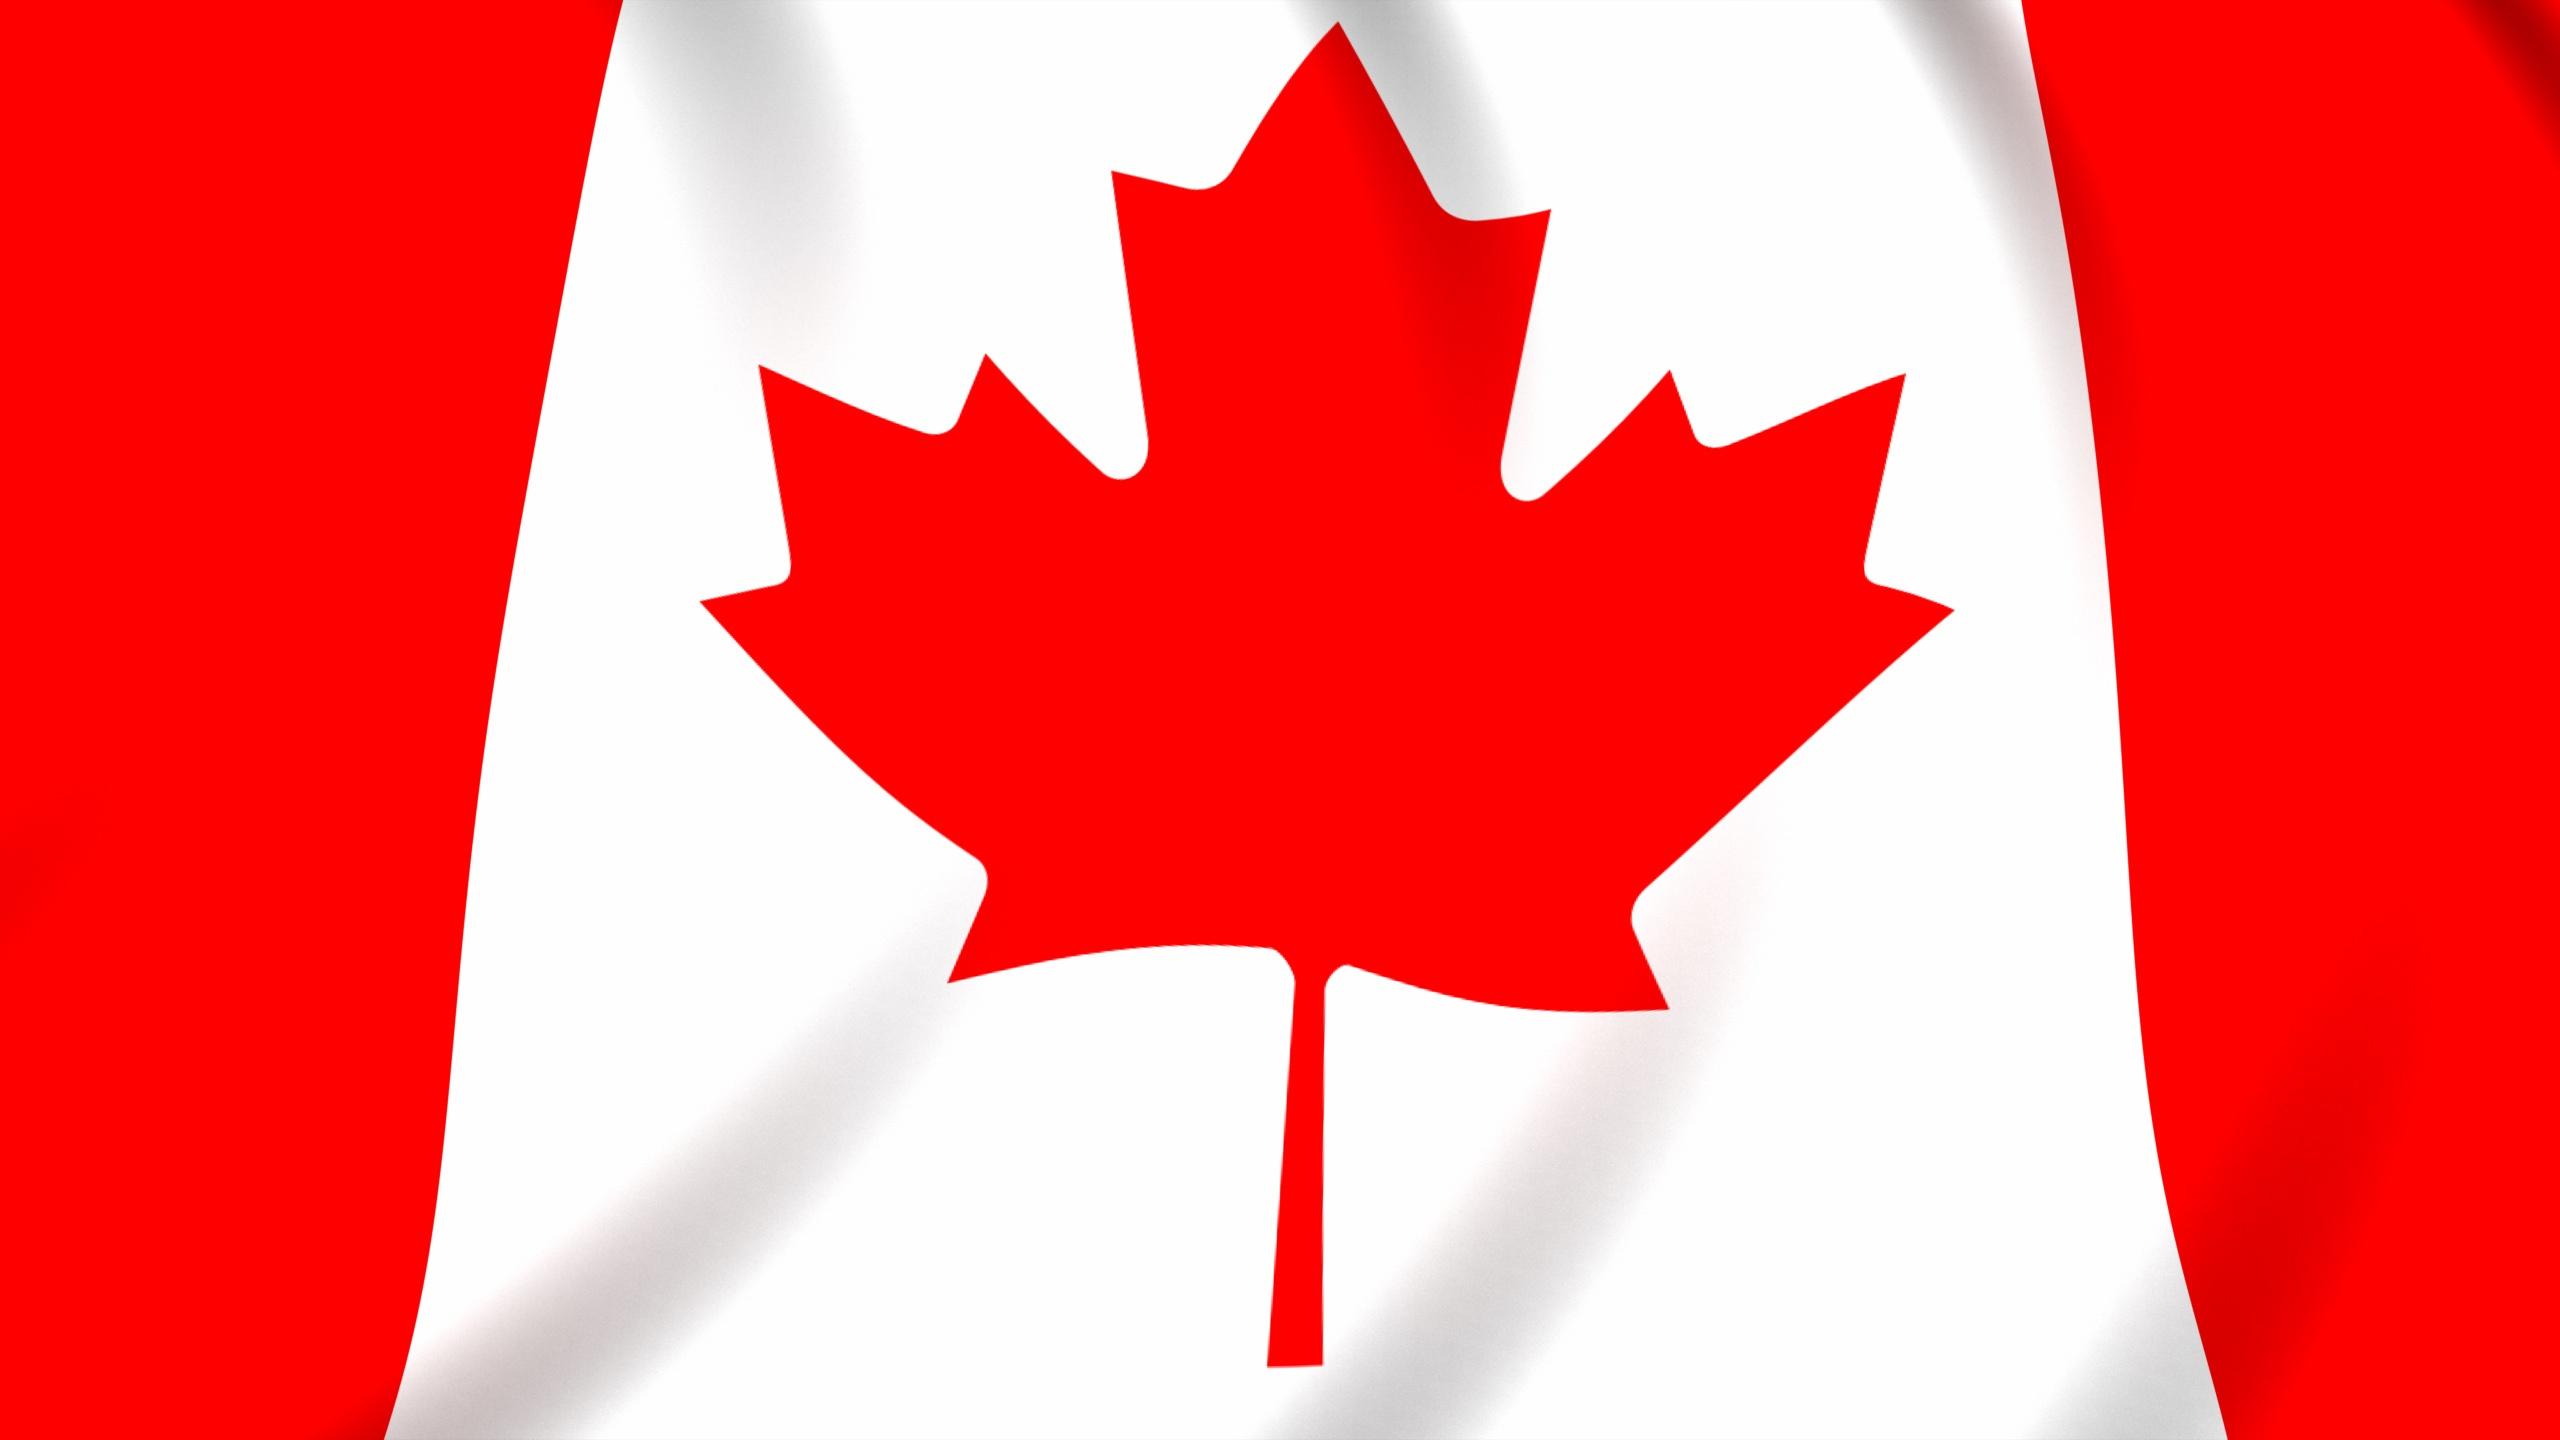 Canada flag wallpaper in 2560x1440 screen resolution 2560x1440